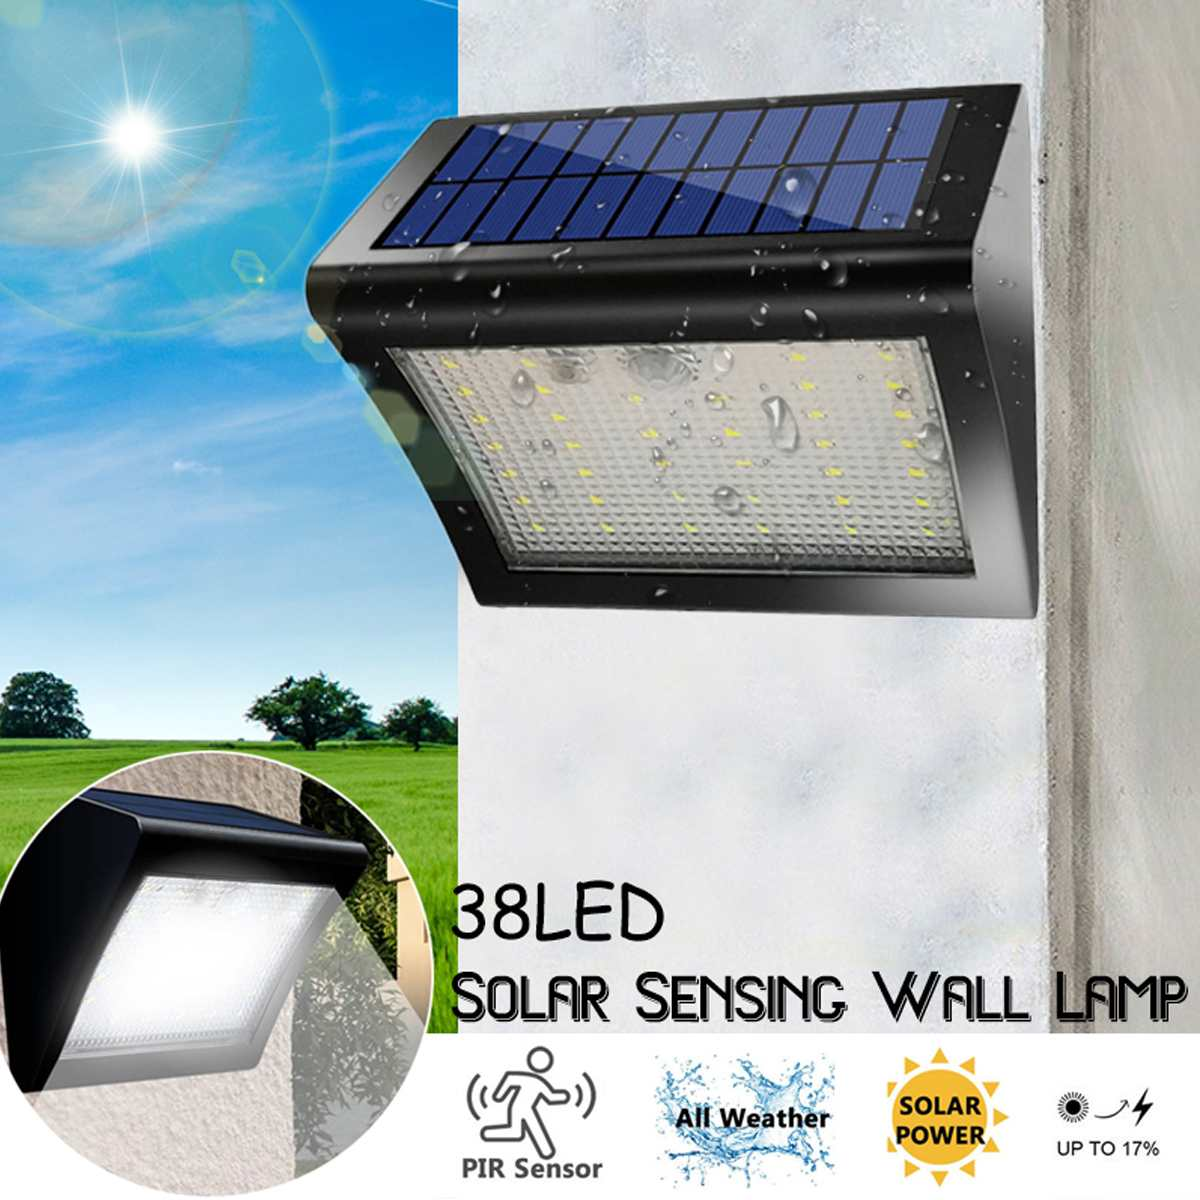 Smuxi 1-6 piezas 38LED luz Solar PIR Sensor de movimiento solar jardín luz impermeable IP65 pared lámpara solar led la lámpara de calle de seguridad